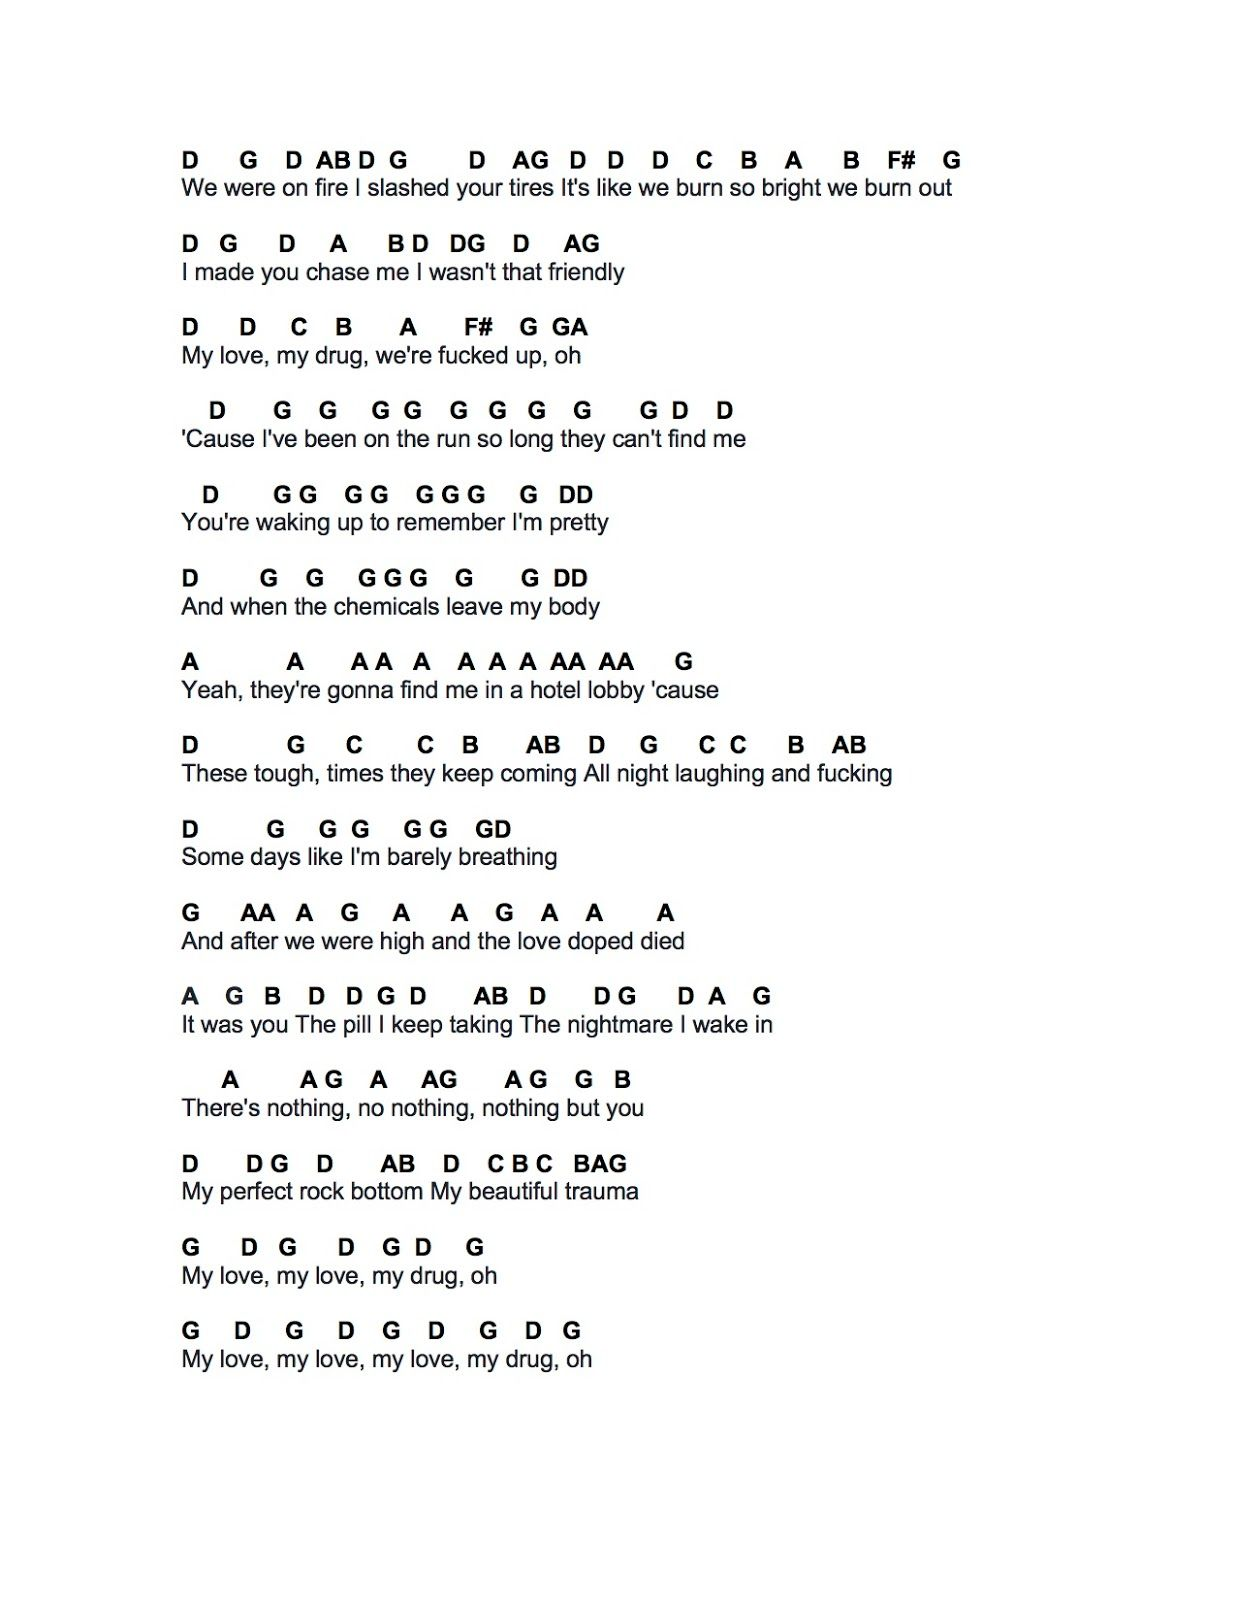 Over 600 Songs For The Flute Music Sheets Pinterest Sheet